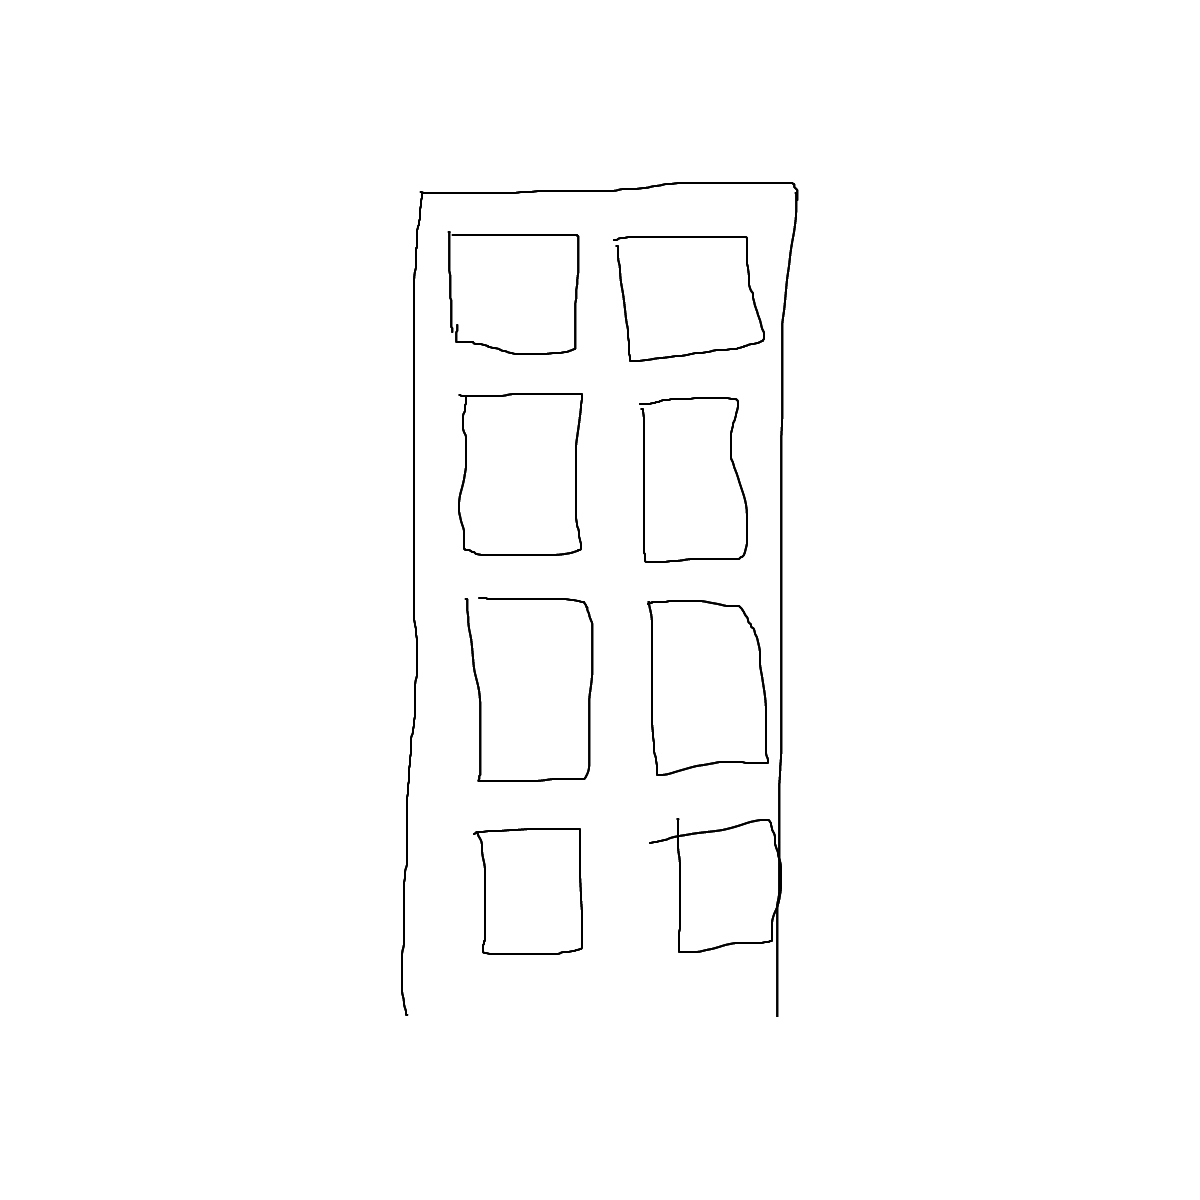 BAAAM drawing#15130 lat:-32.2596015930175800lng: 148.6463470458984400